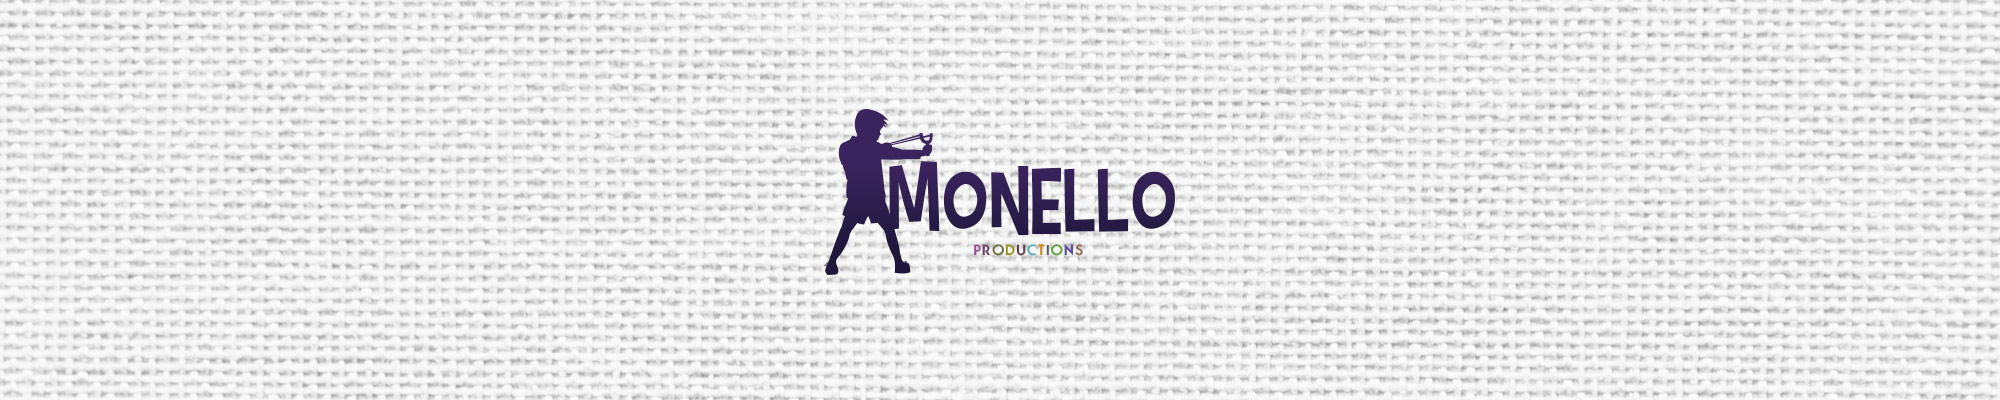 Monello productions